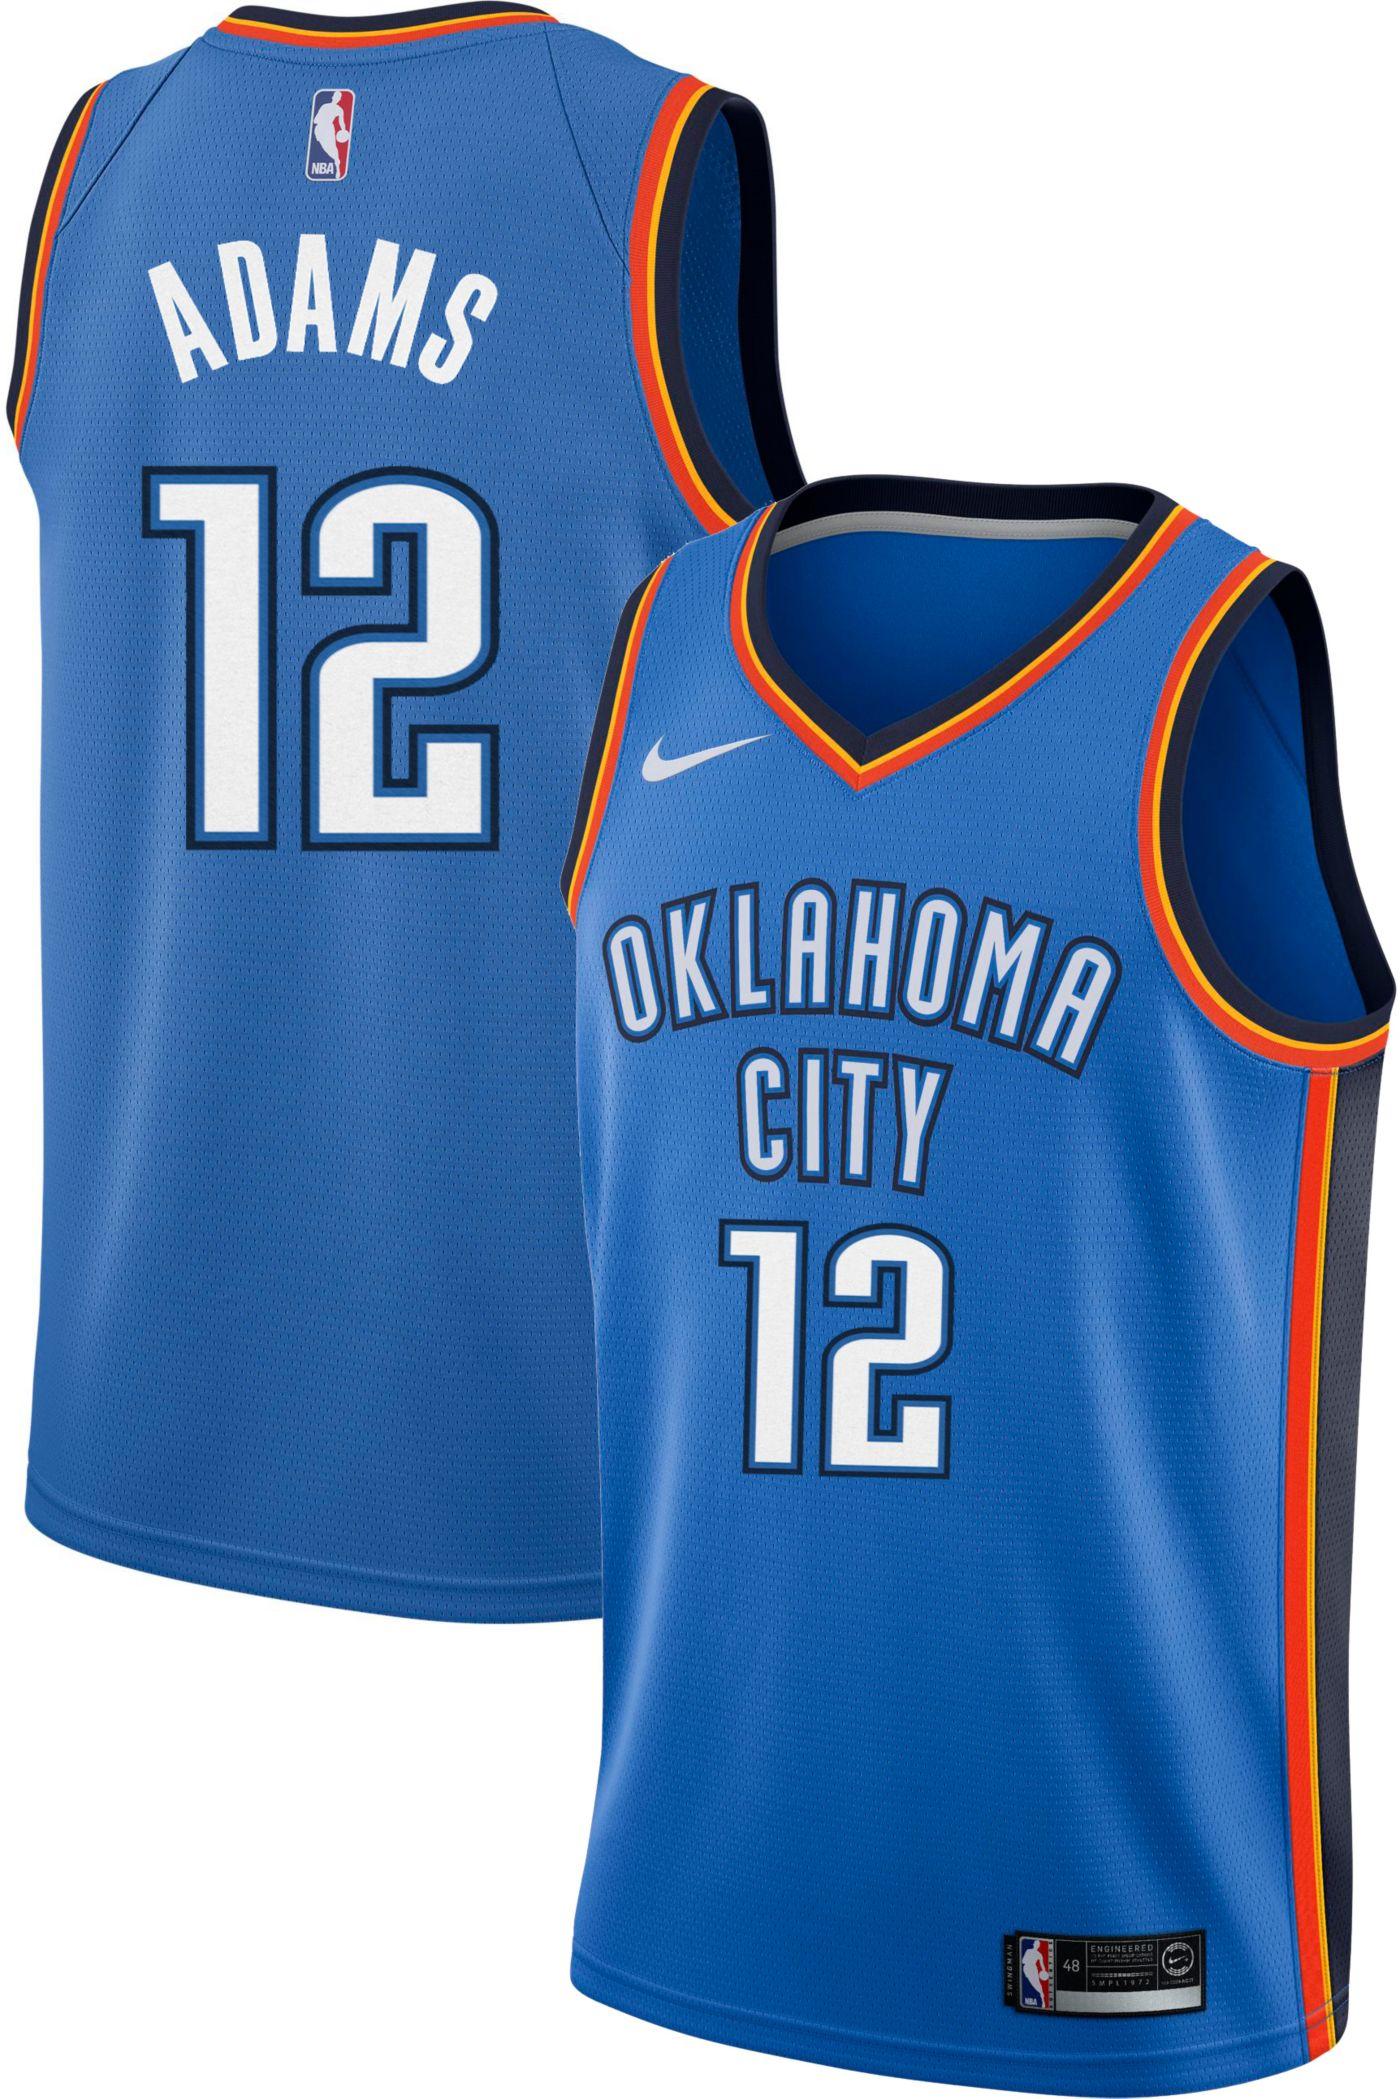 Nike Men's Oklahoma City Thunder Steven Adams #12 Blue  Dri-FIT Swingman Jersey